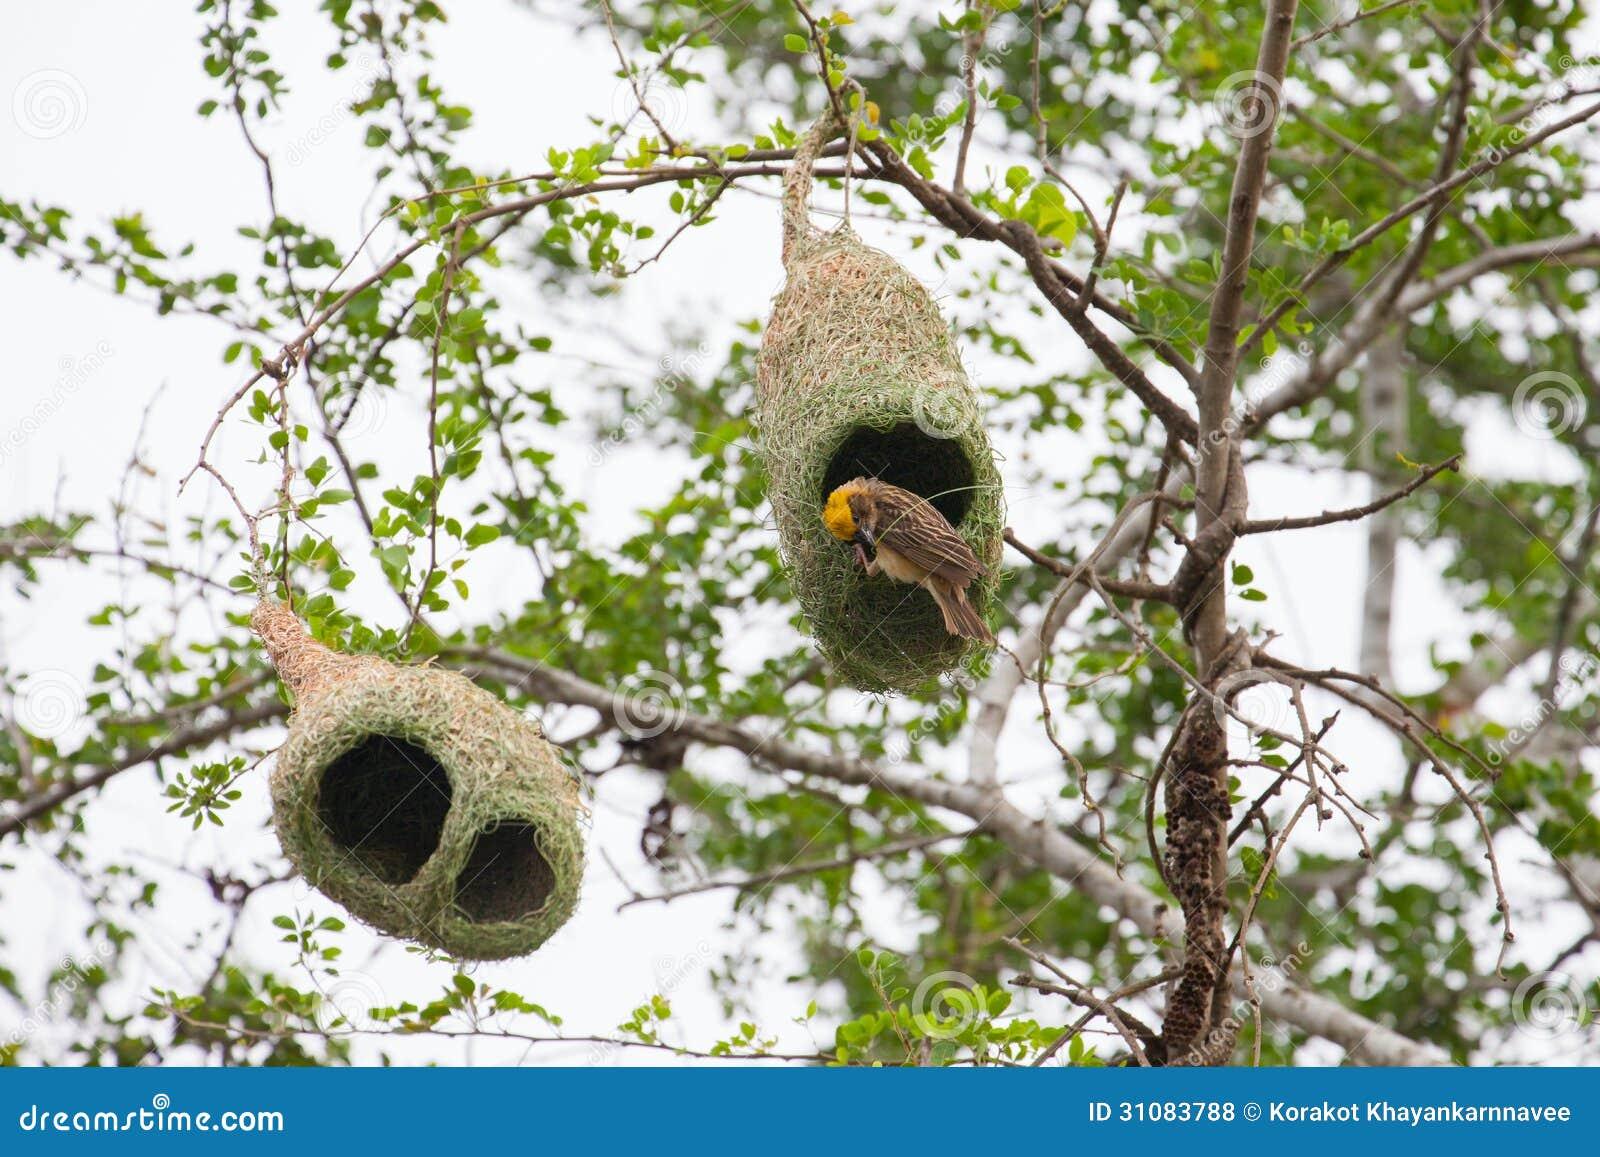 The Baya Weaver (Ploceus philippinus) is a weaverbird found across ...